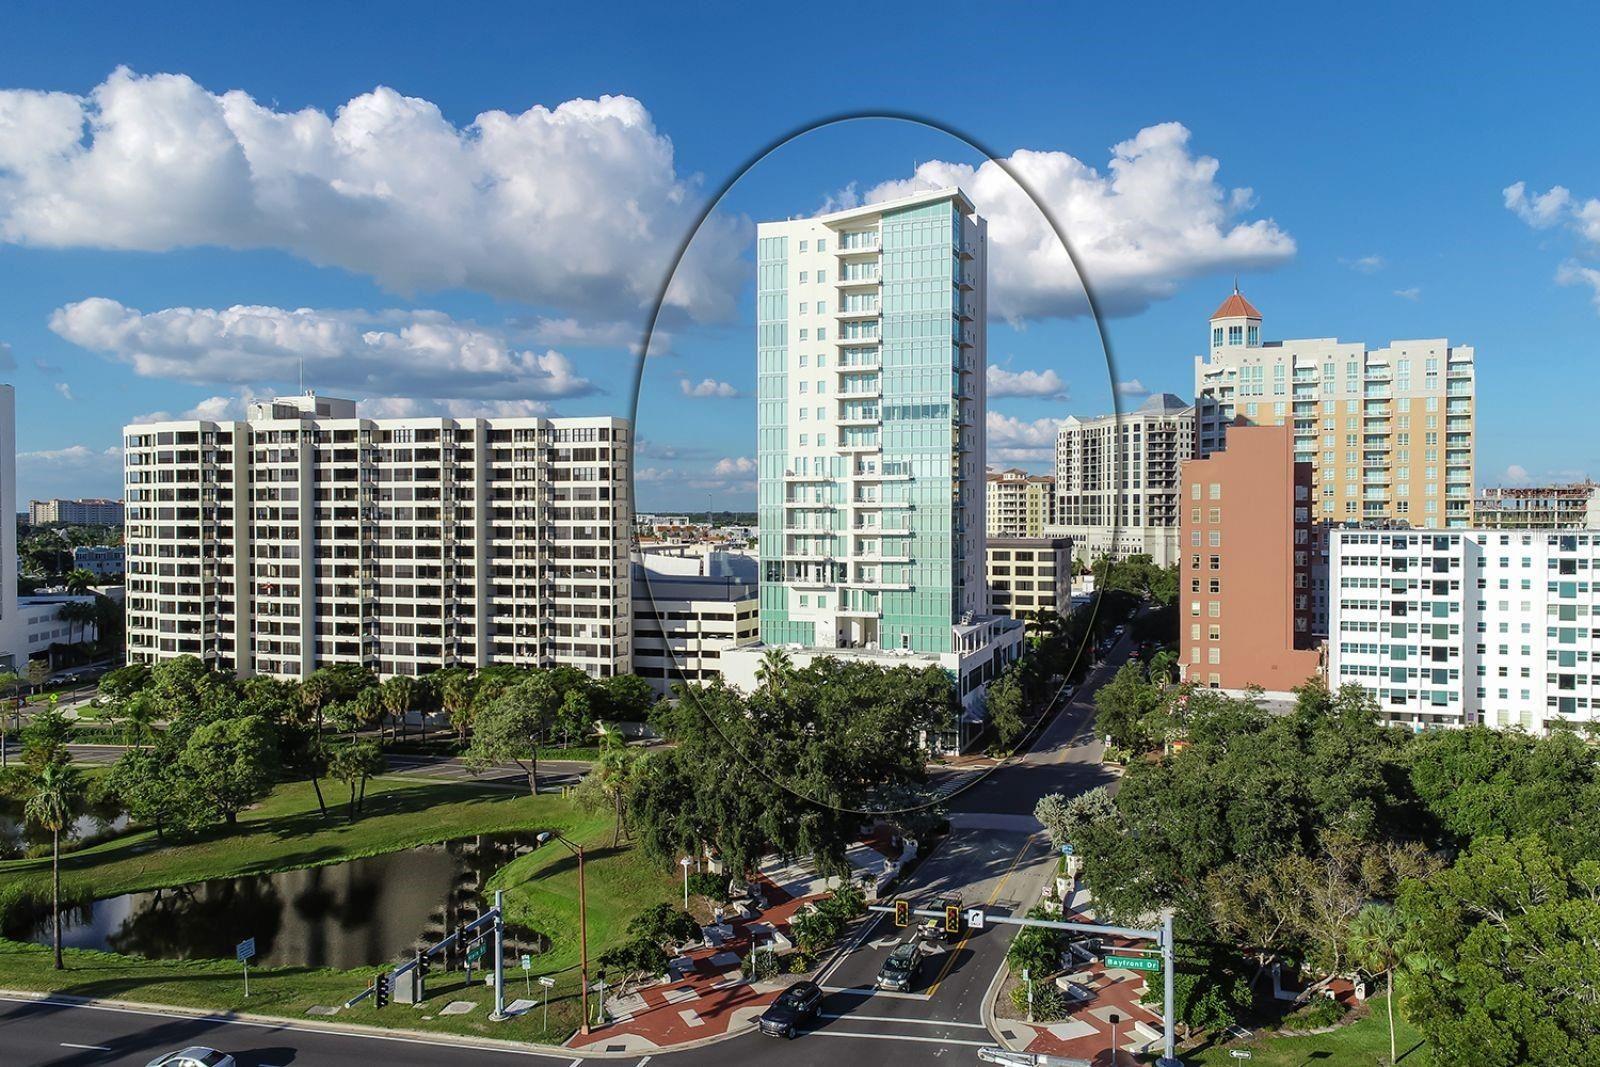 Photo of 1301 MAIN STREET #401, SARASOTA, FL 34236 (MLS # A4502354)